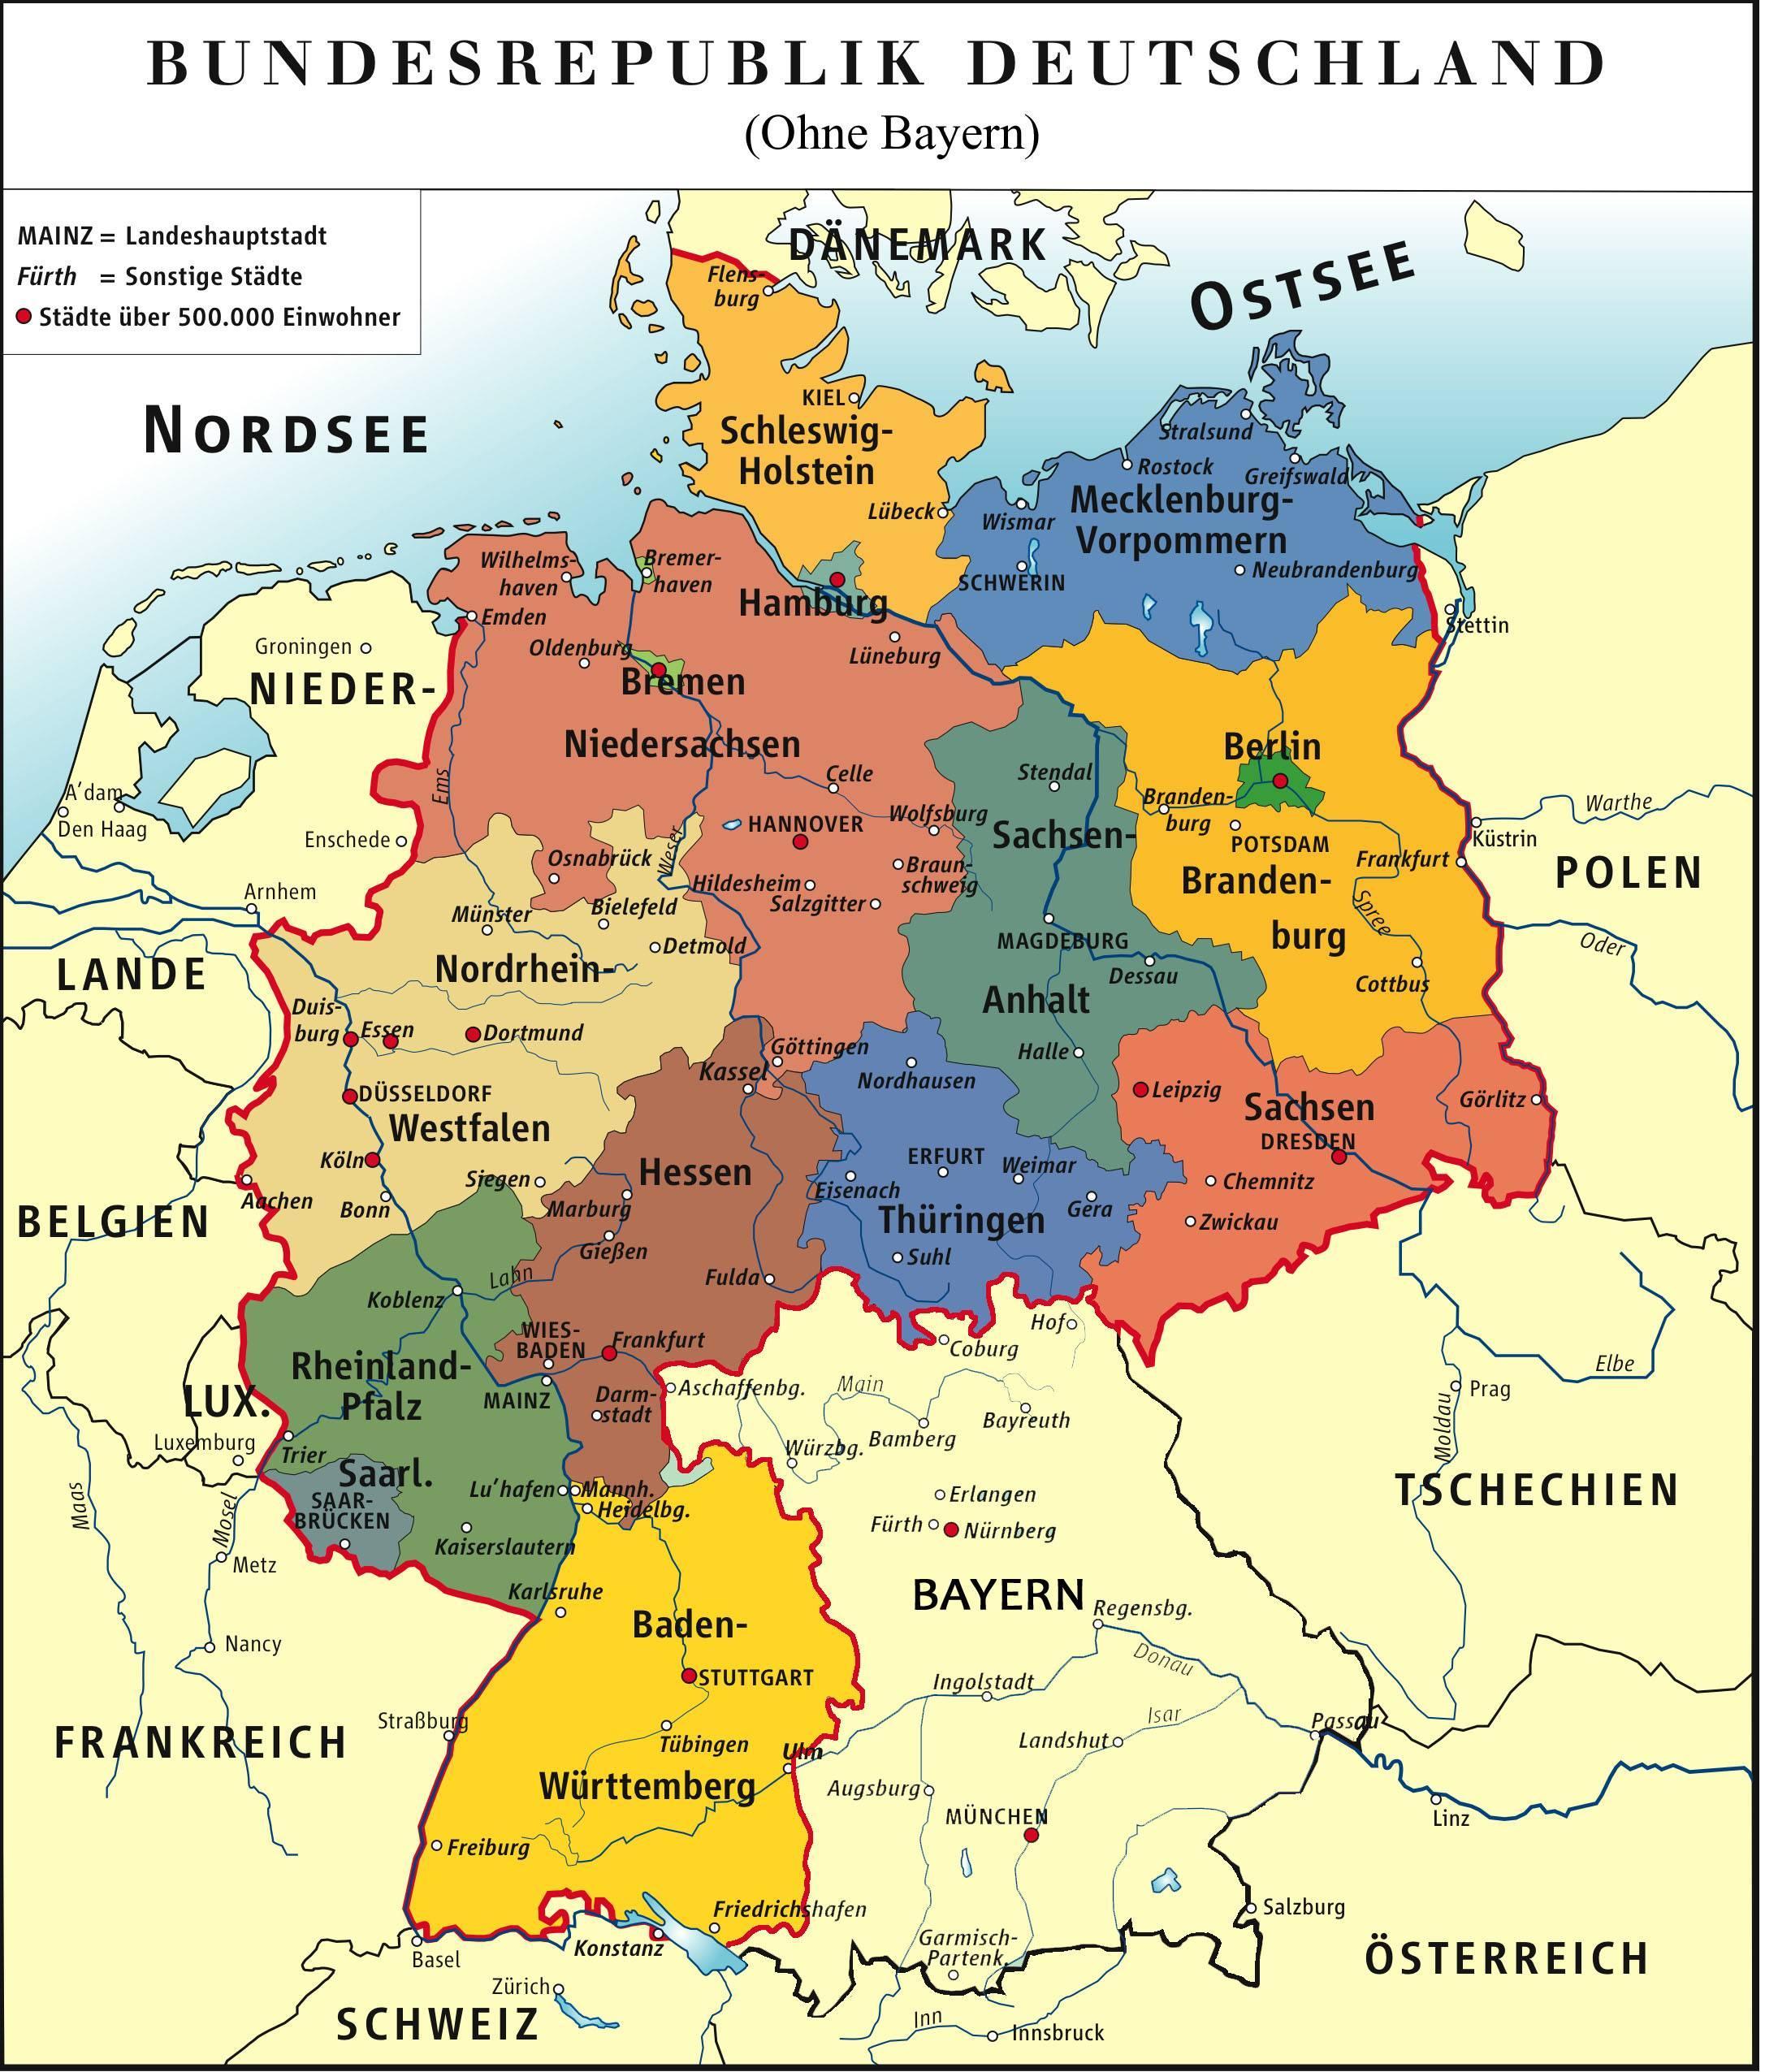 Bayern Tyskland Karta Bayern Munchen Karta Bayern I Tyskland